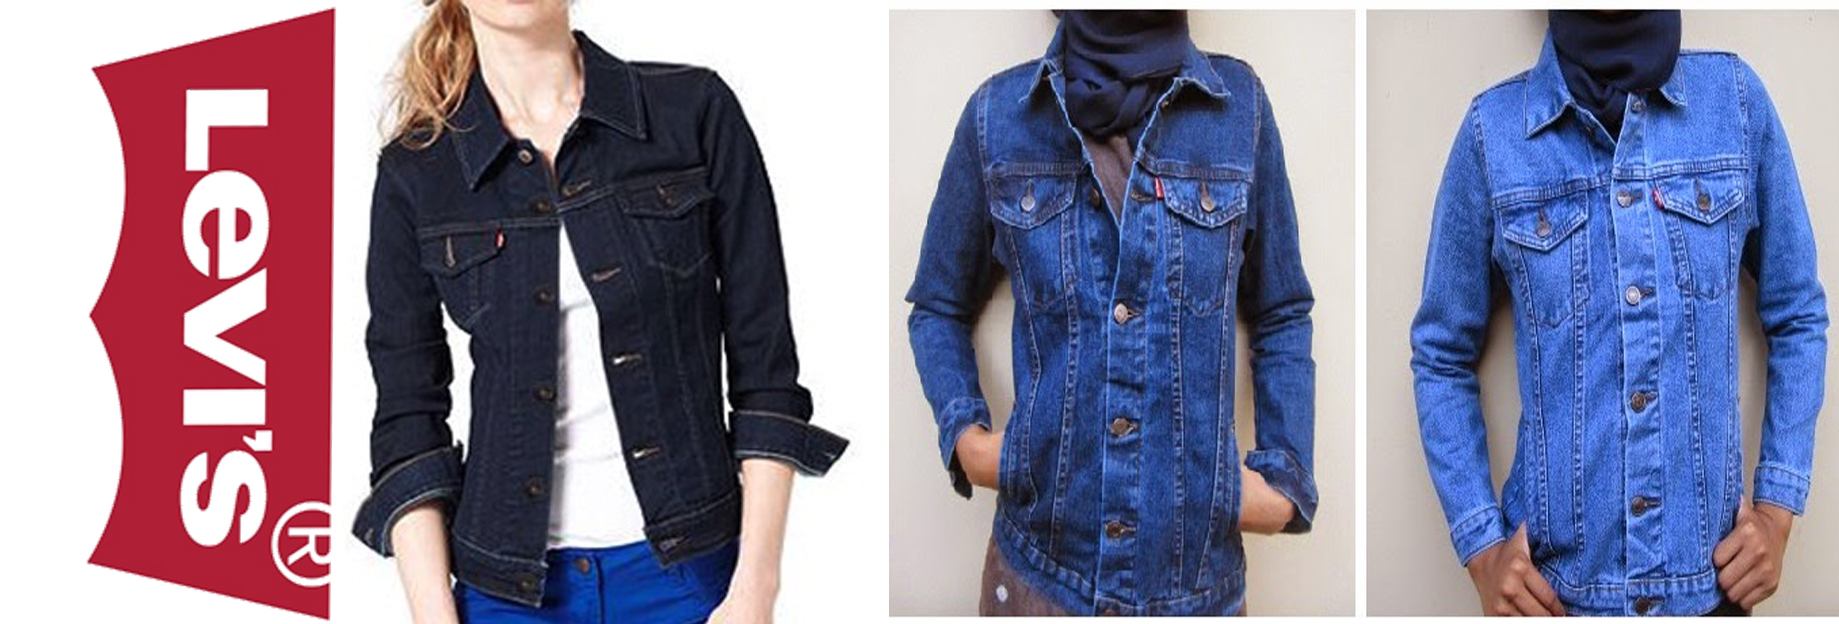 Jual Jaket Levis Wanita Trendy Keren Agus Jeans Collection88 Tokopedia